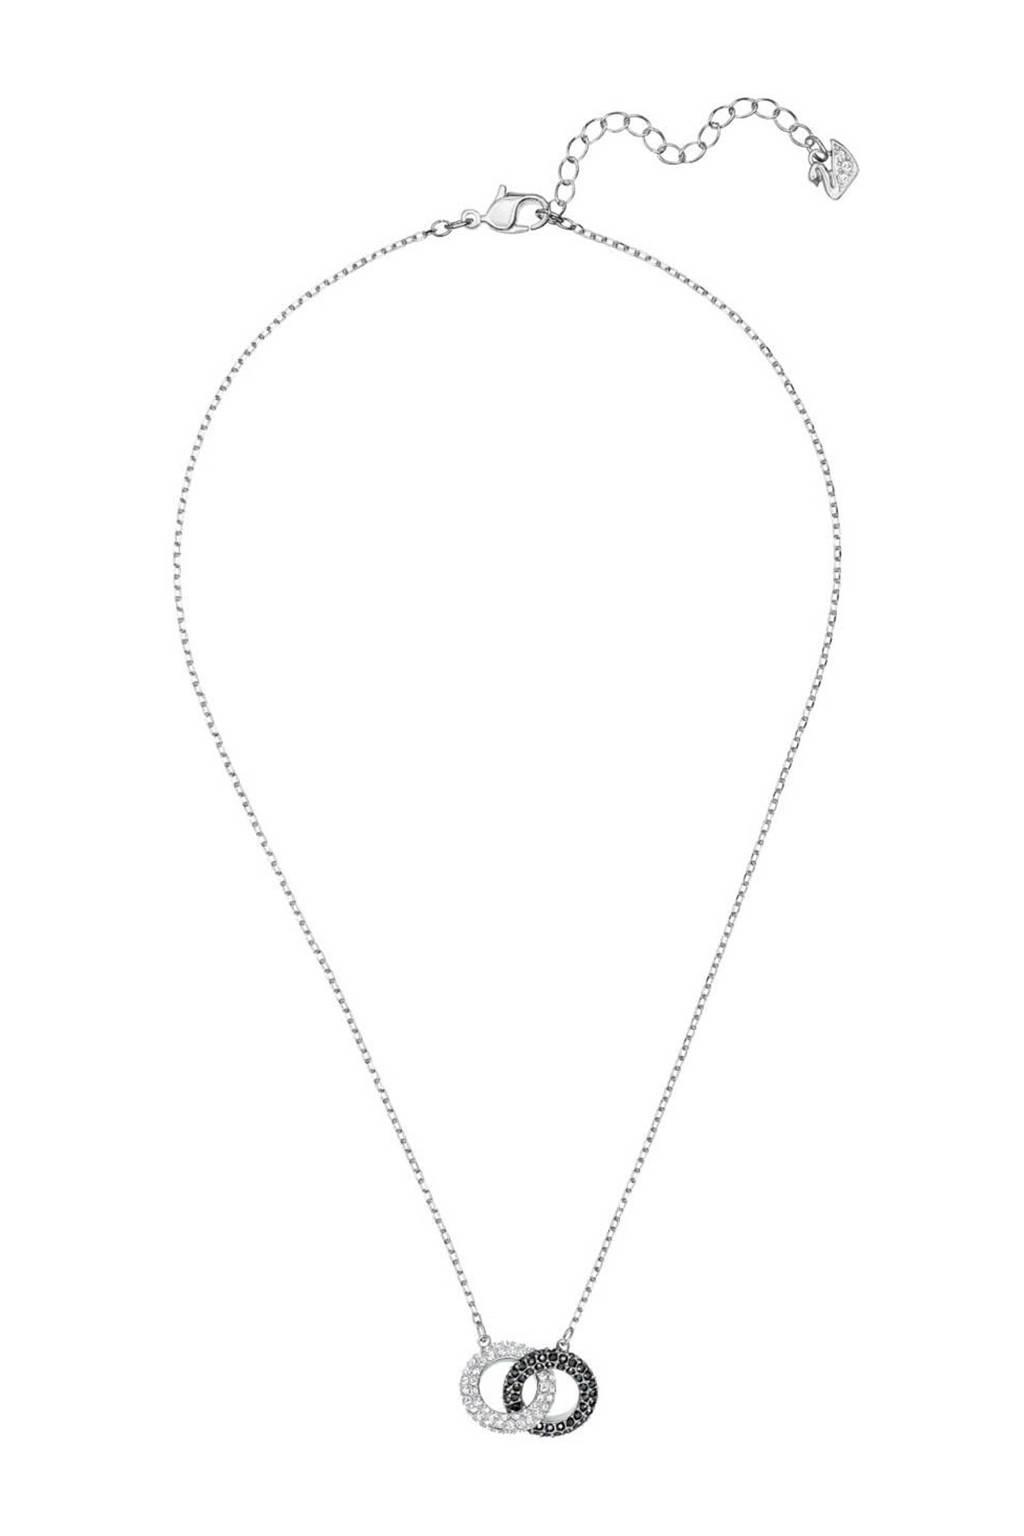 Swarovski ketting - 5445706, Zilverkleurig